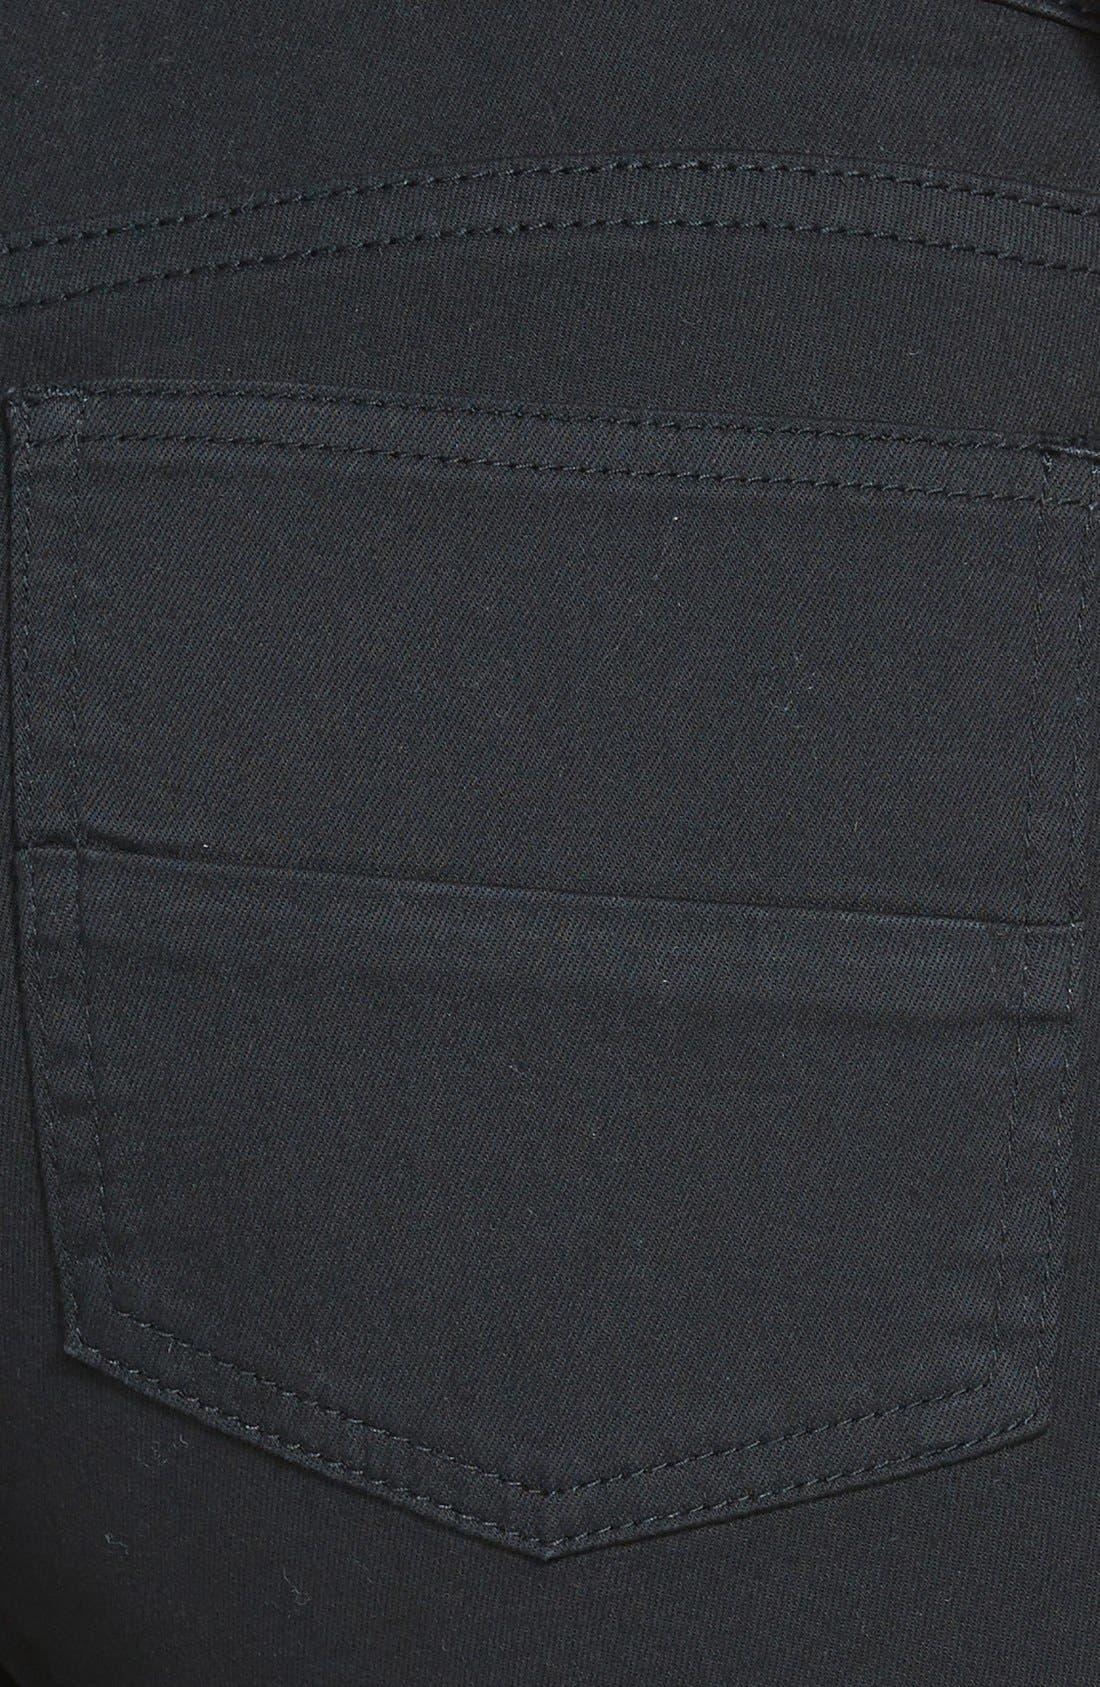 'Natalie' Twill Bermuda Shorts,                             Alternate thumbnail 7, color,                             001